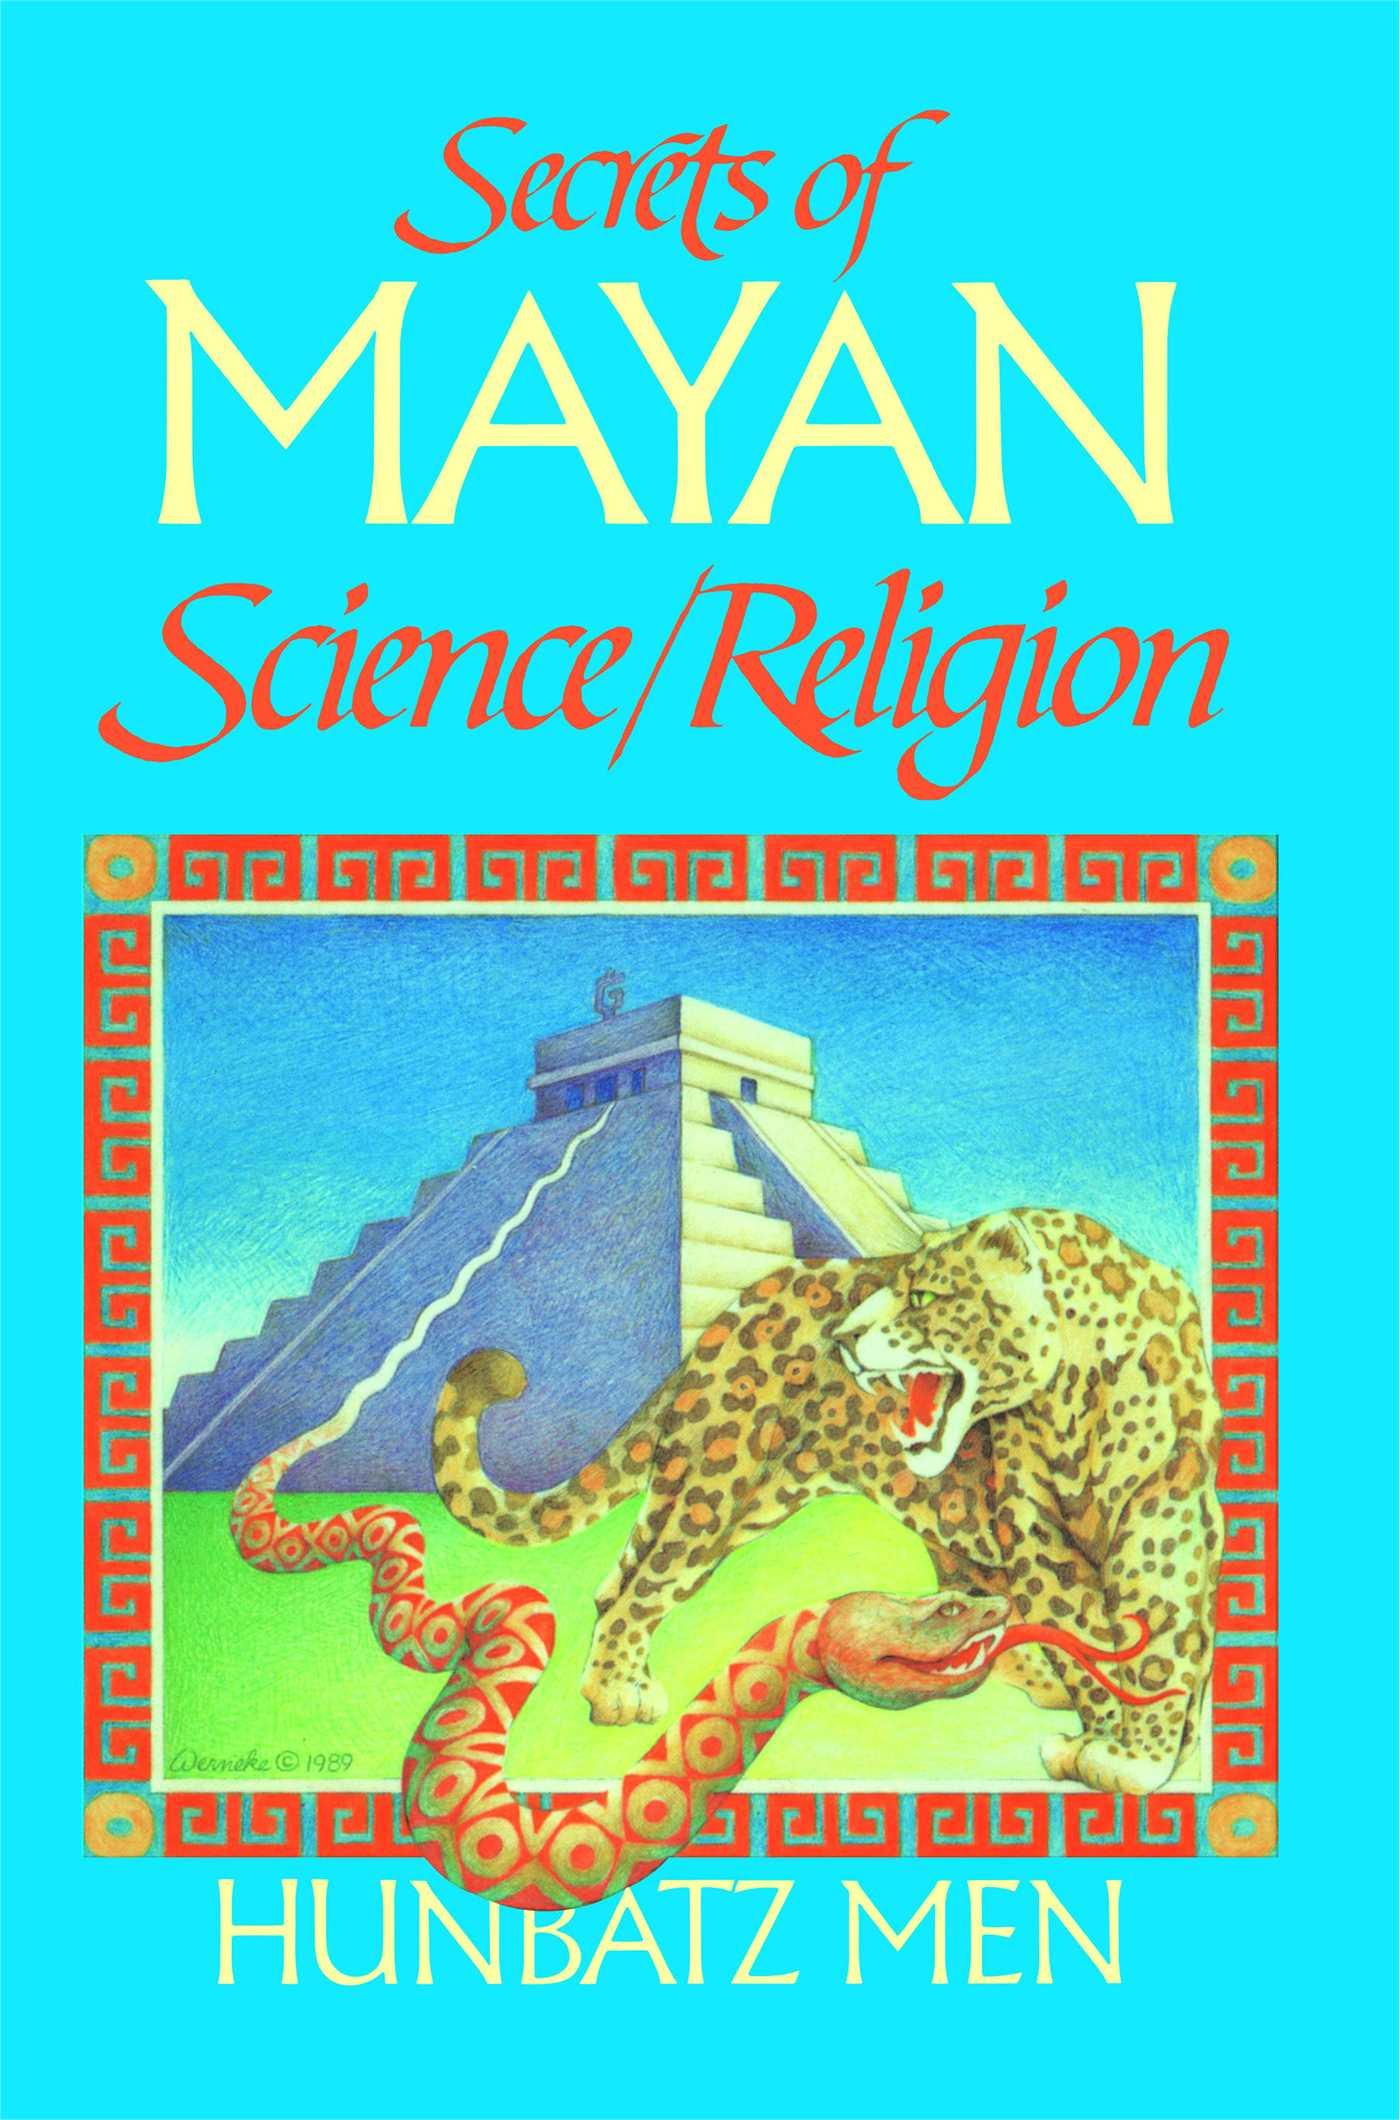 Secrets of mayan science religion 9780939680634 hr